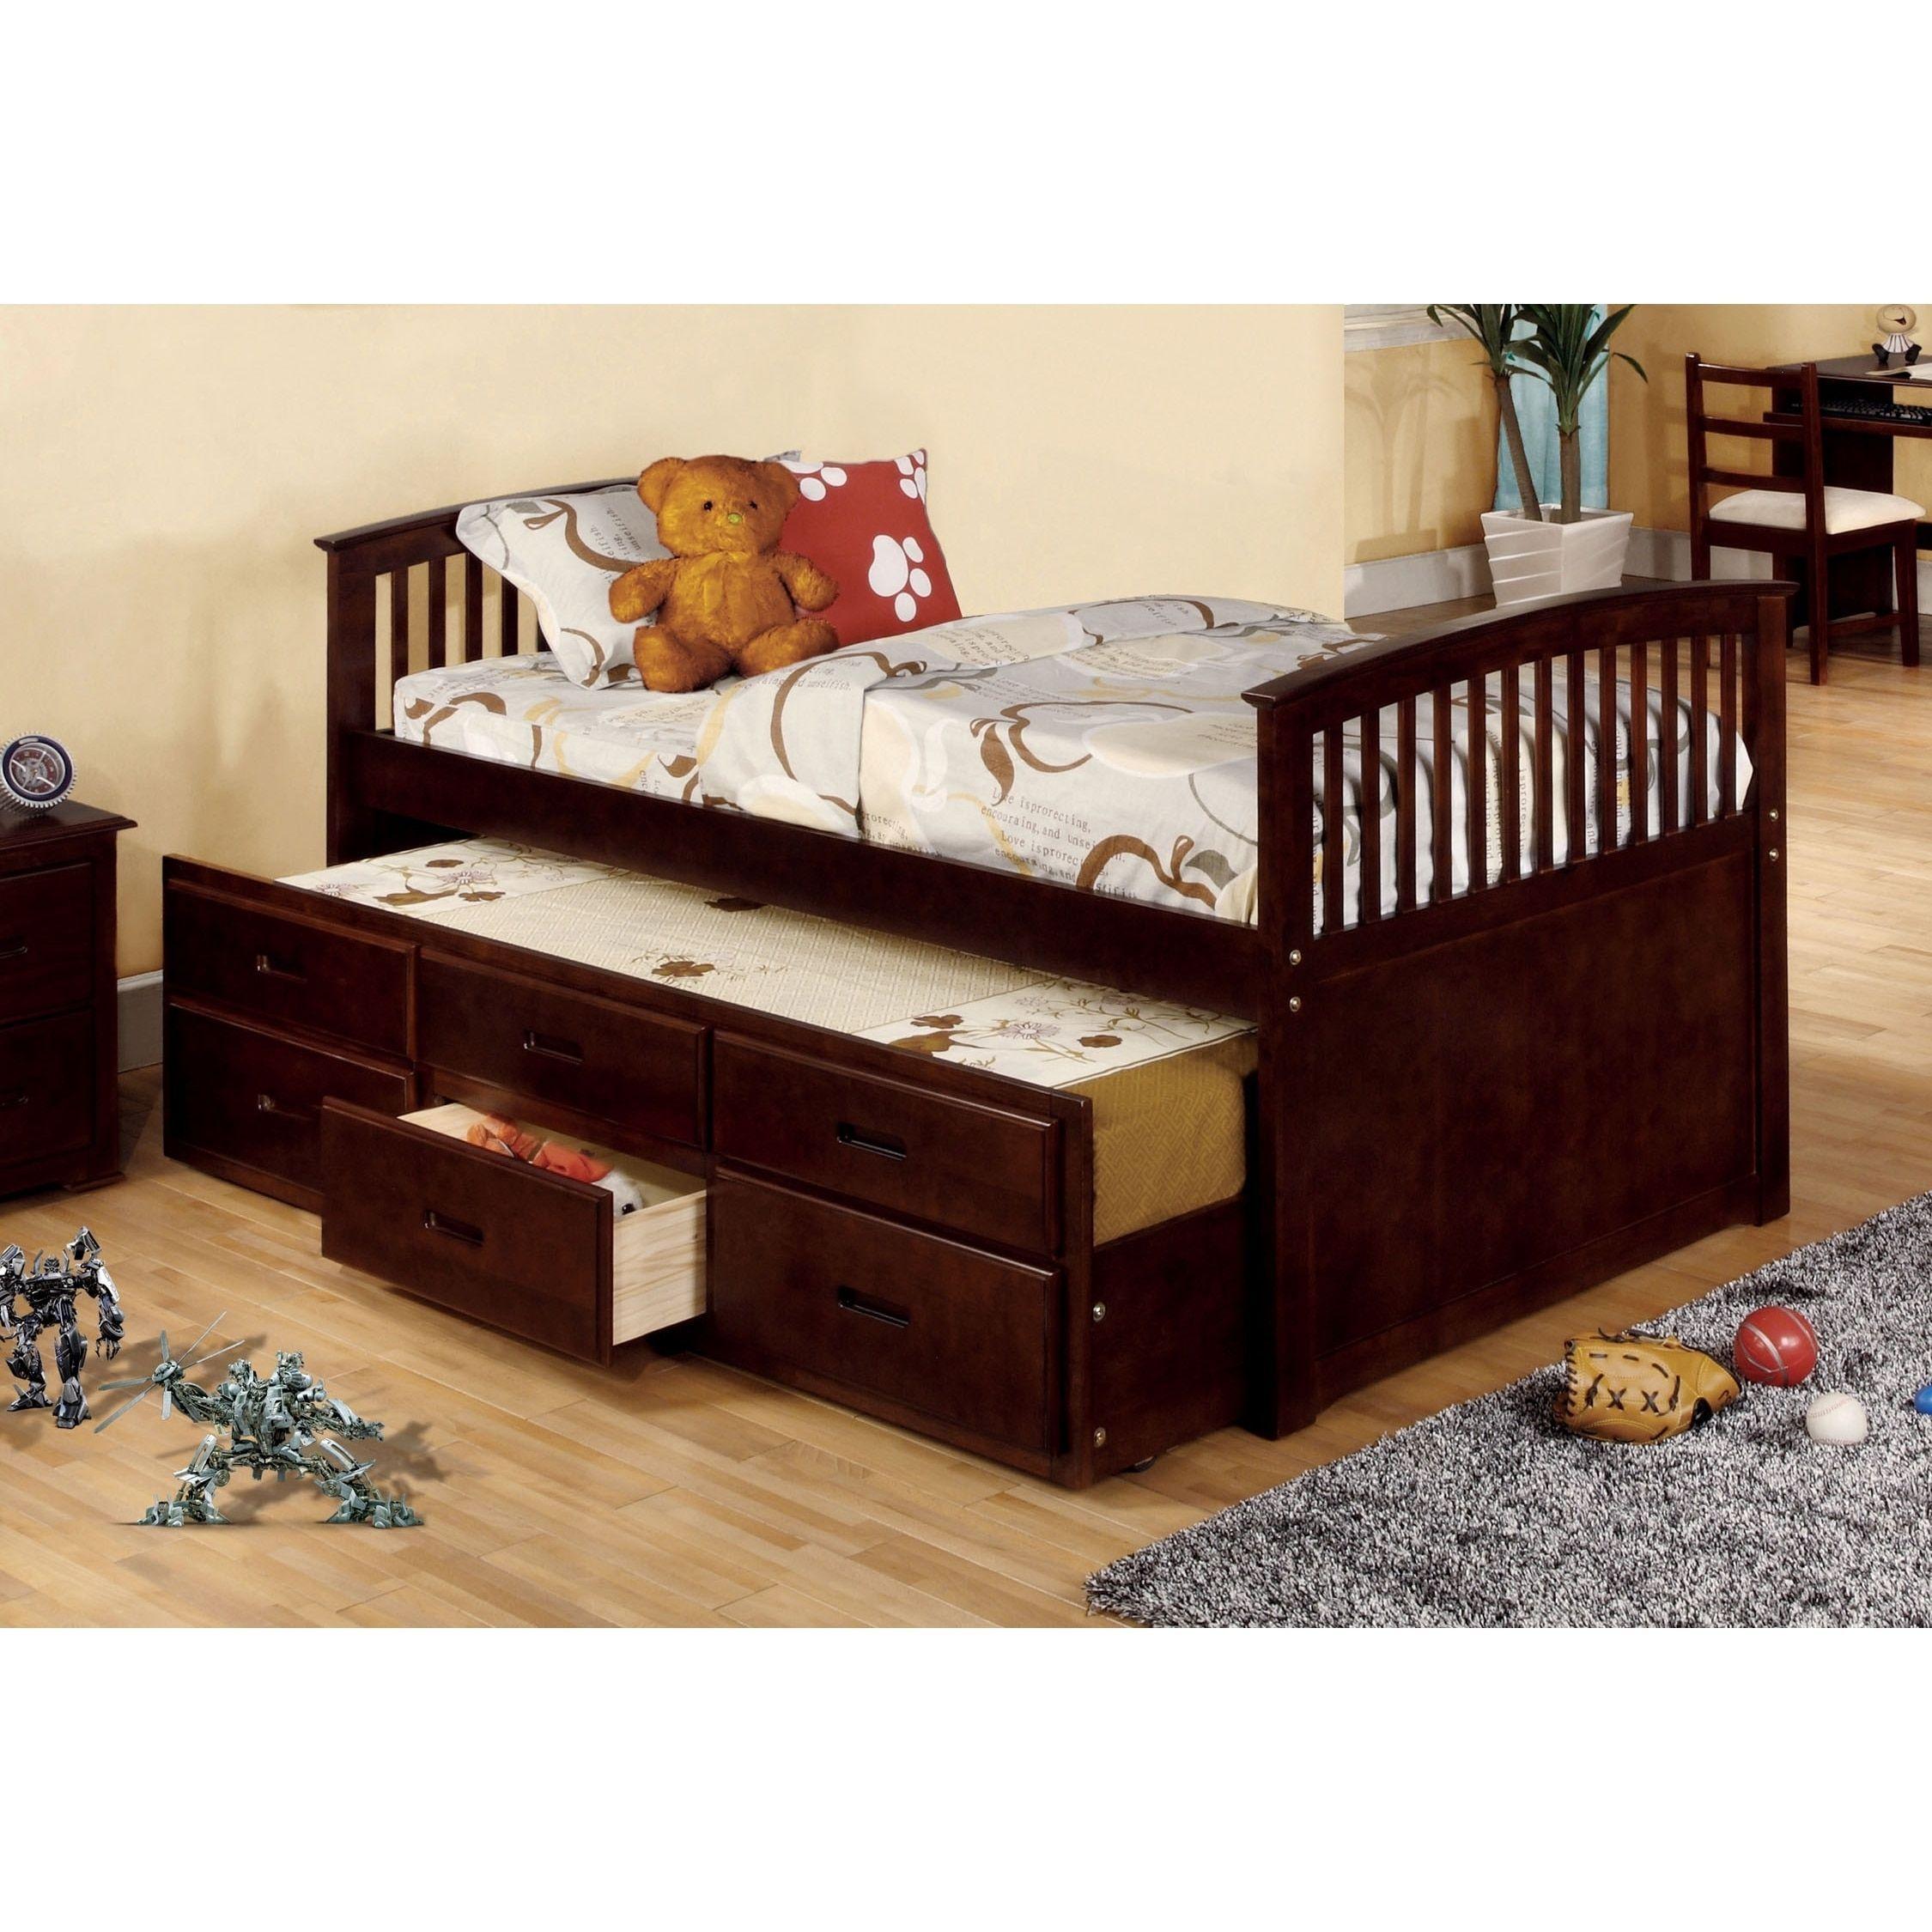 Loft captains bed twin  Furniture of America Bernadette Dark Walnut Mission Style Captain